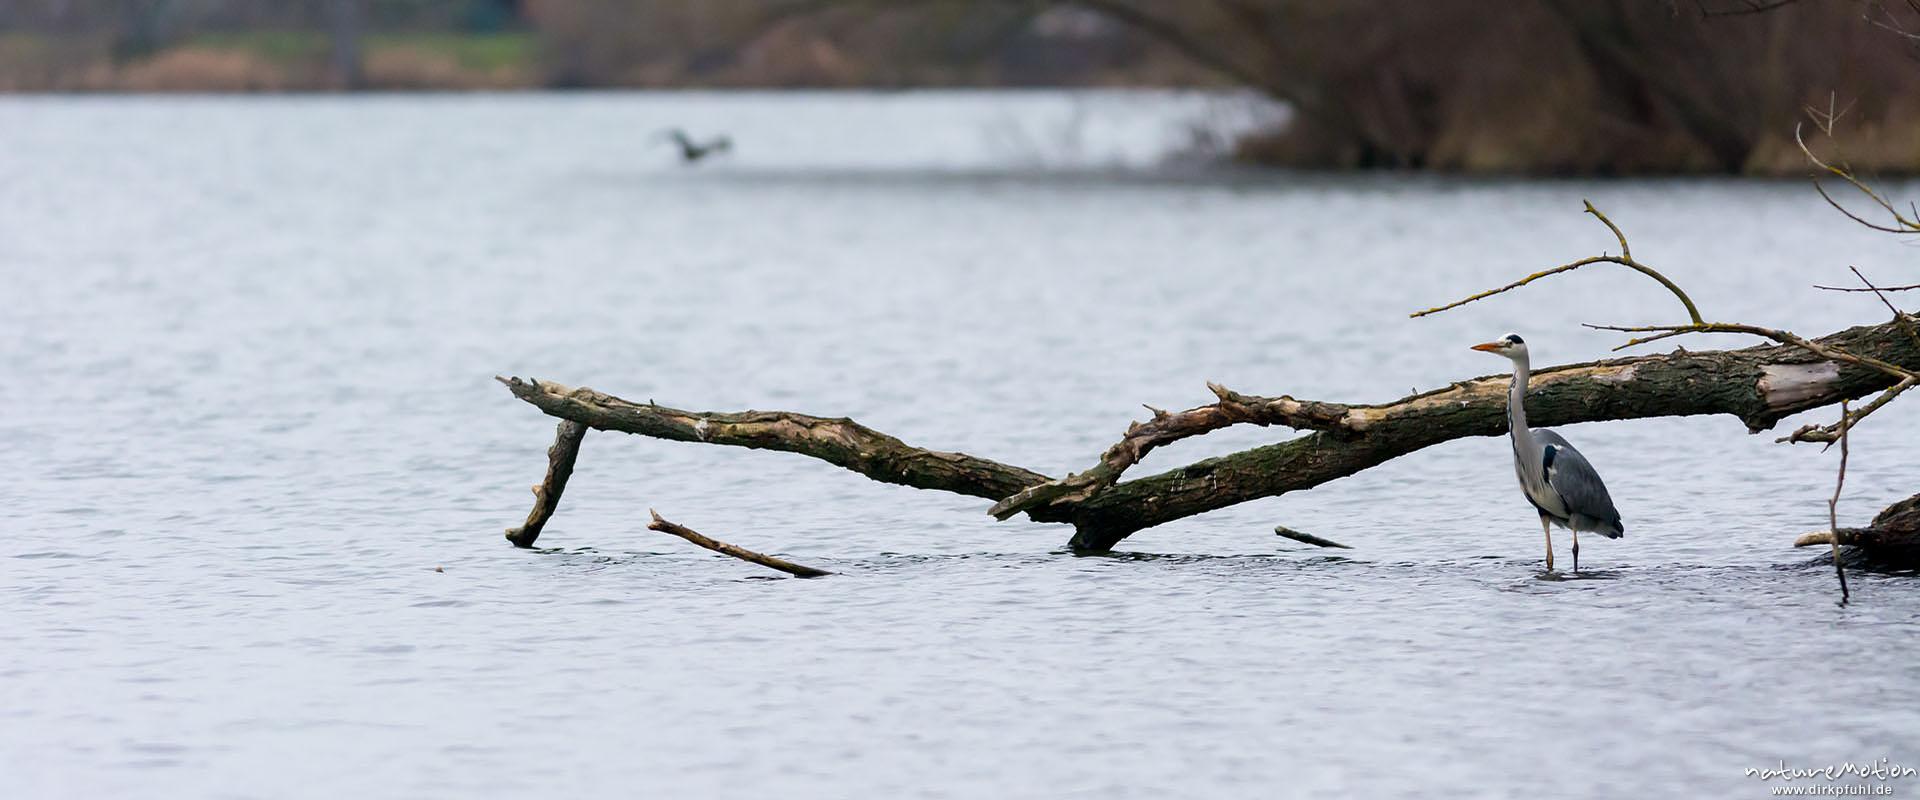 Graureiher verbringen die Wintermonate am Göttinger Kiesssee